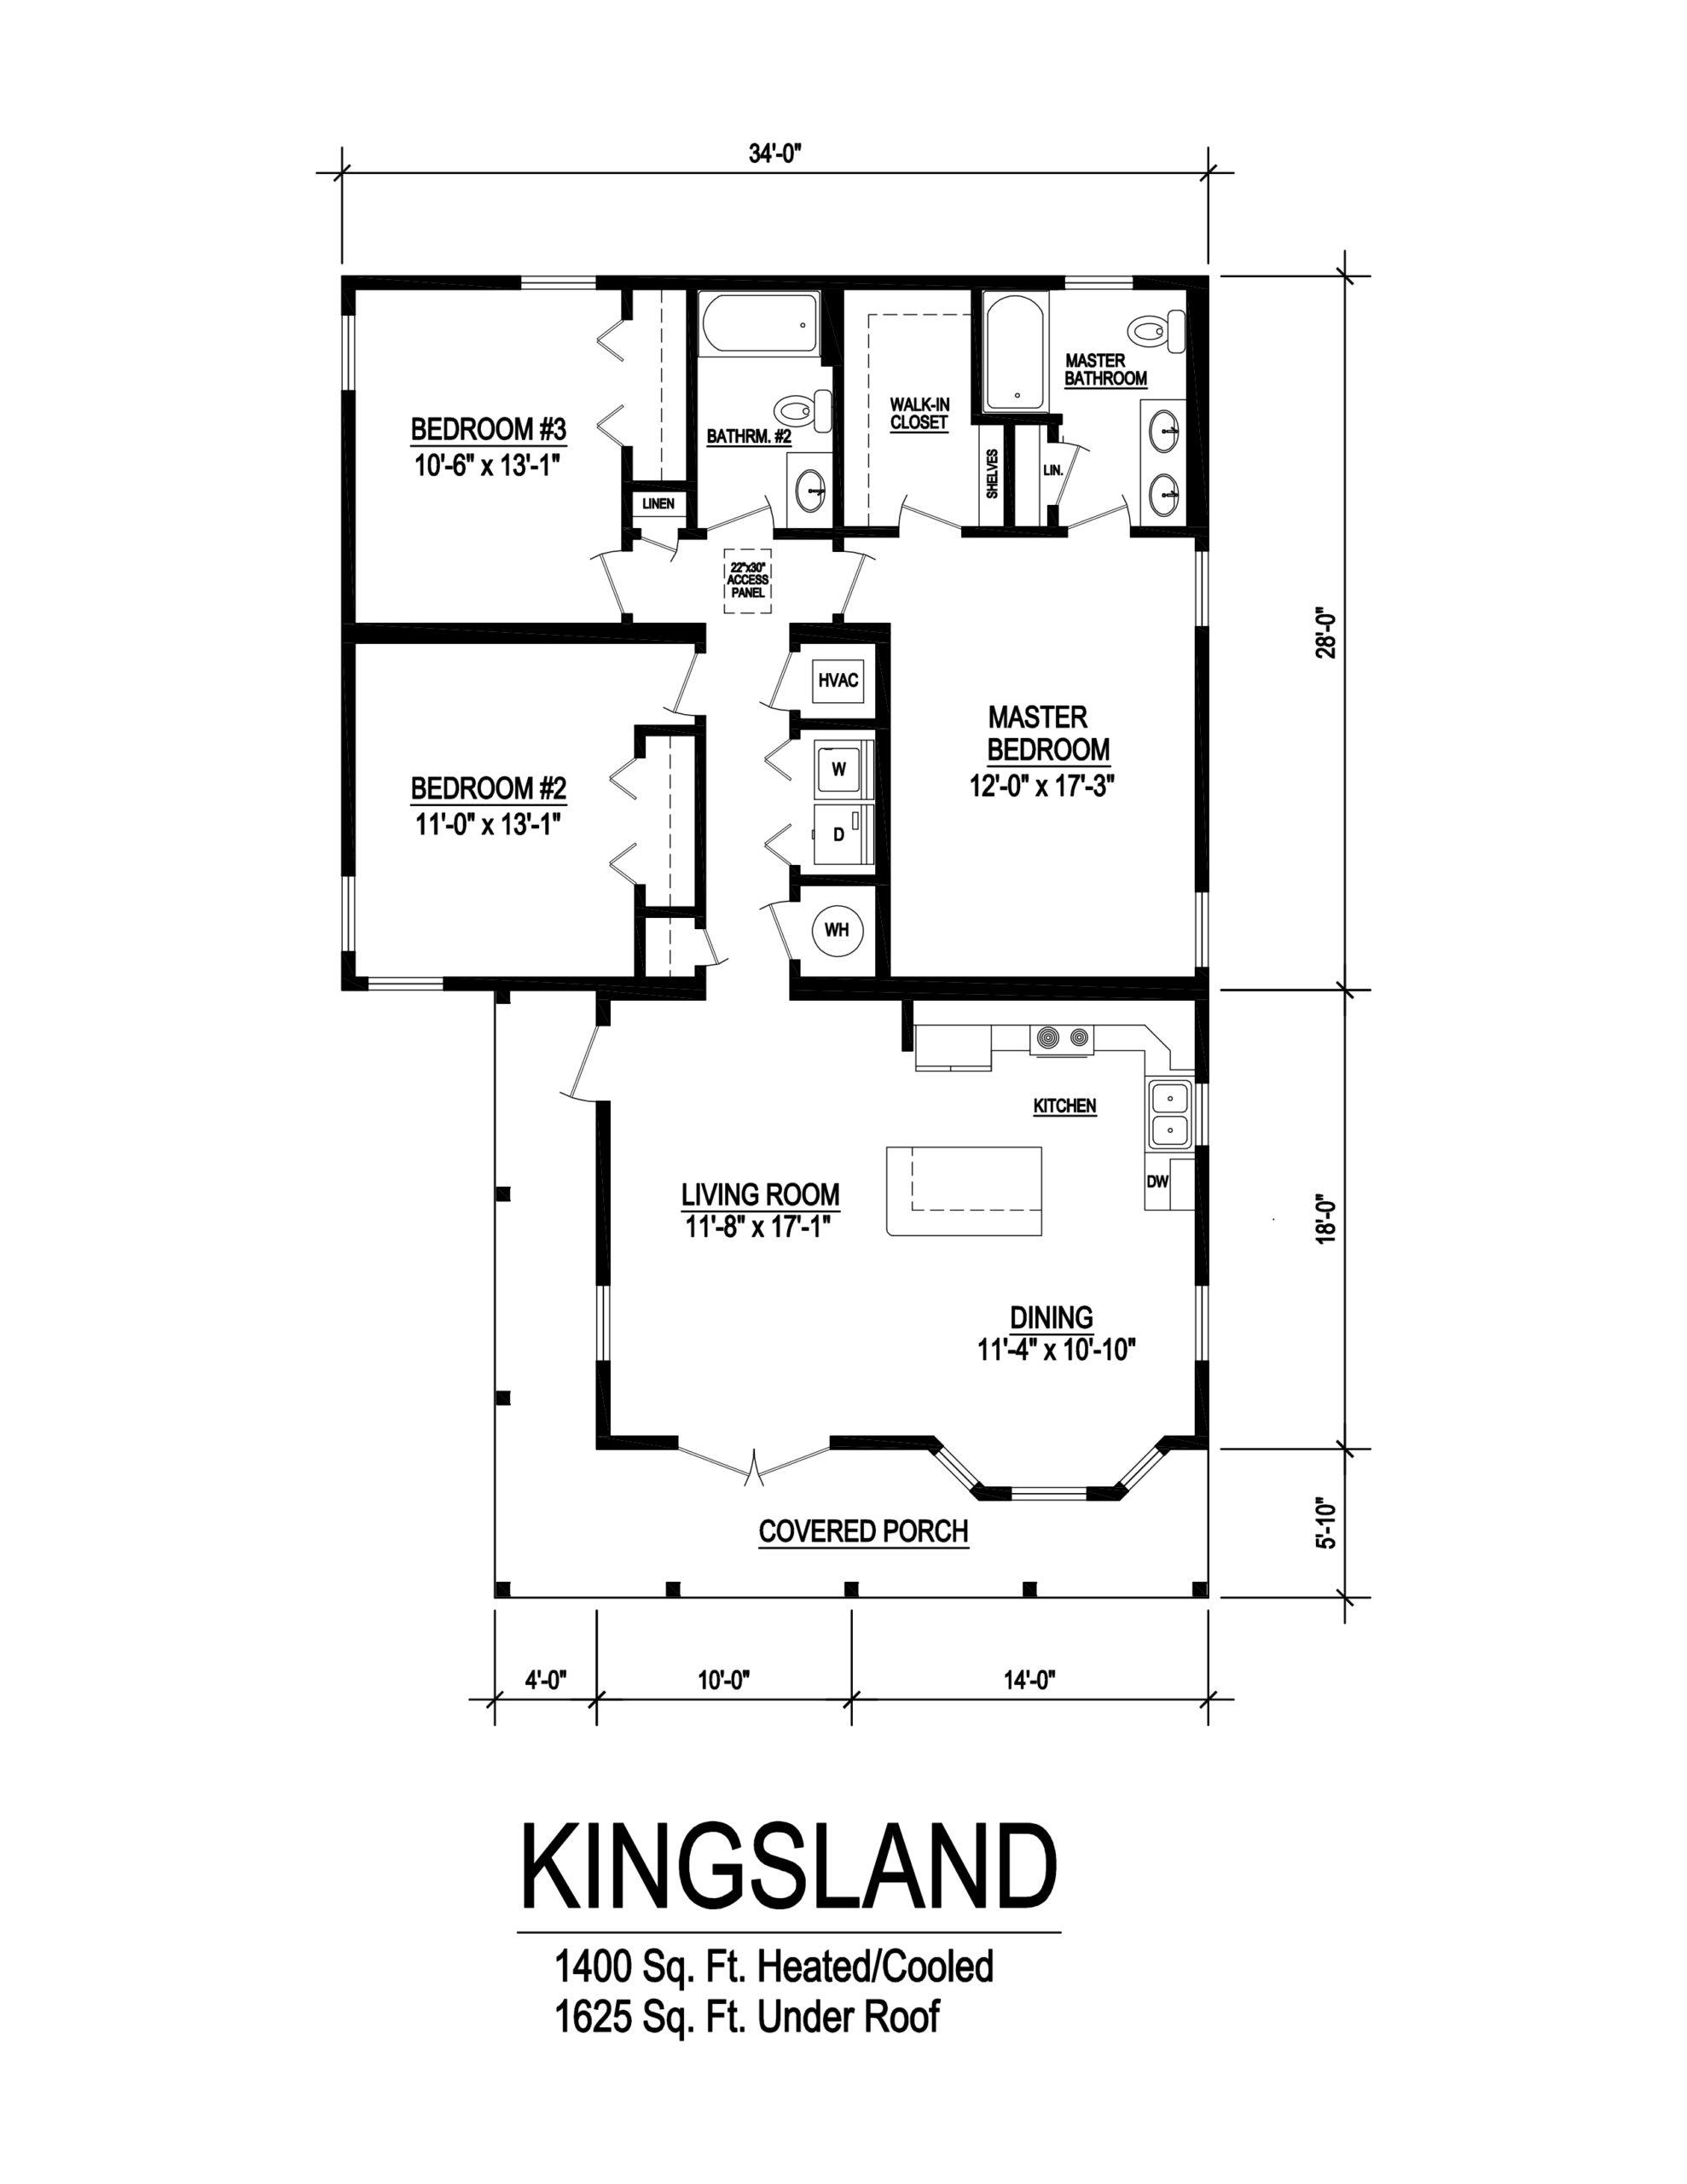 kingsland modular home floorplan